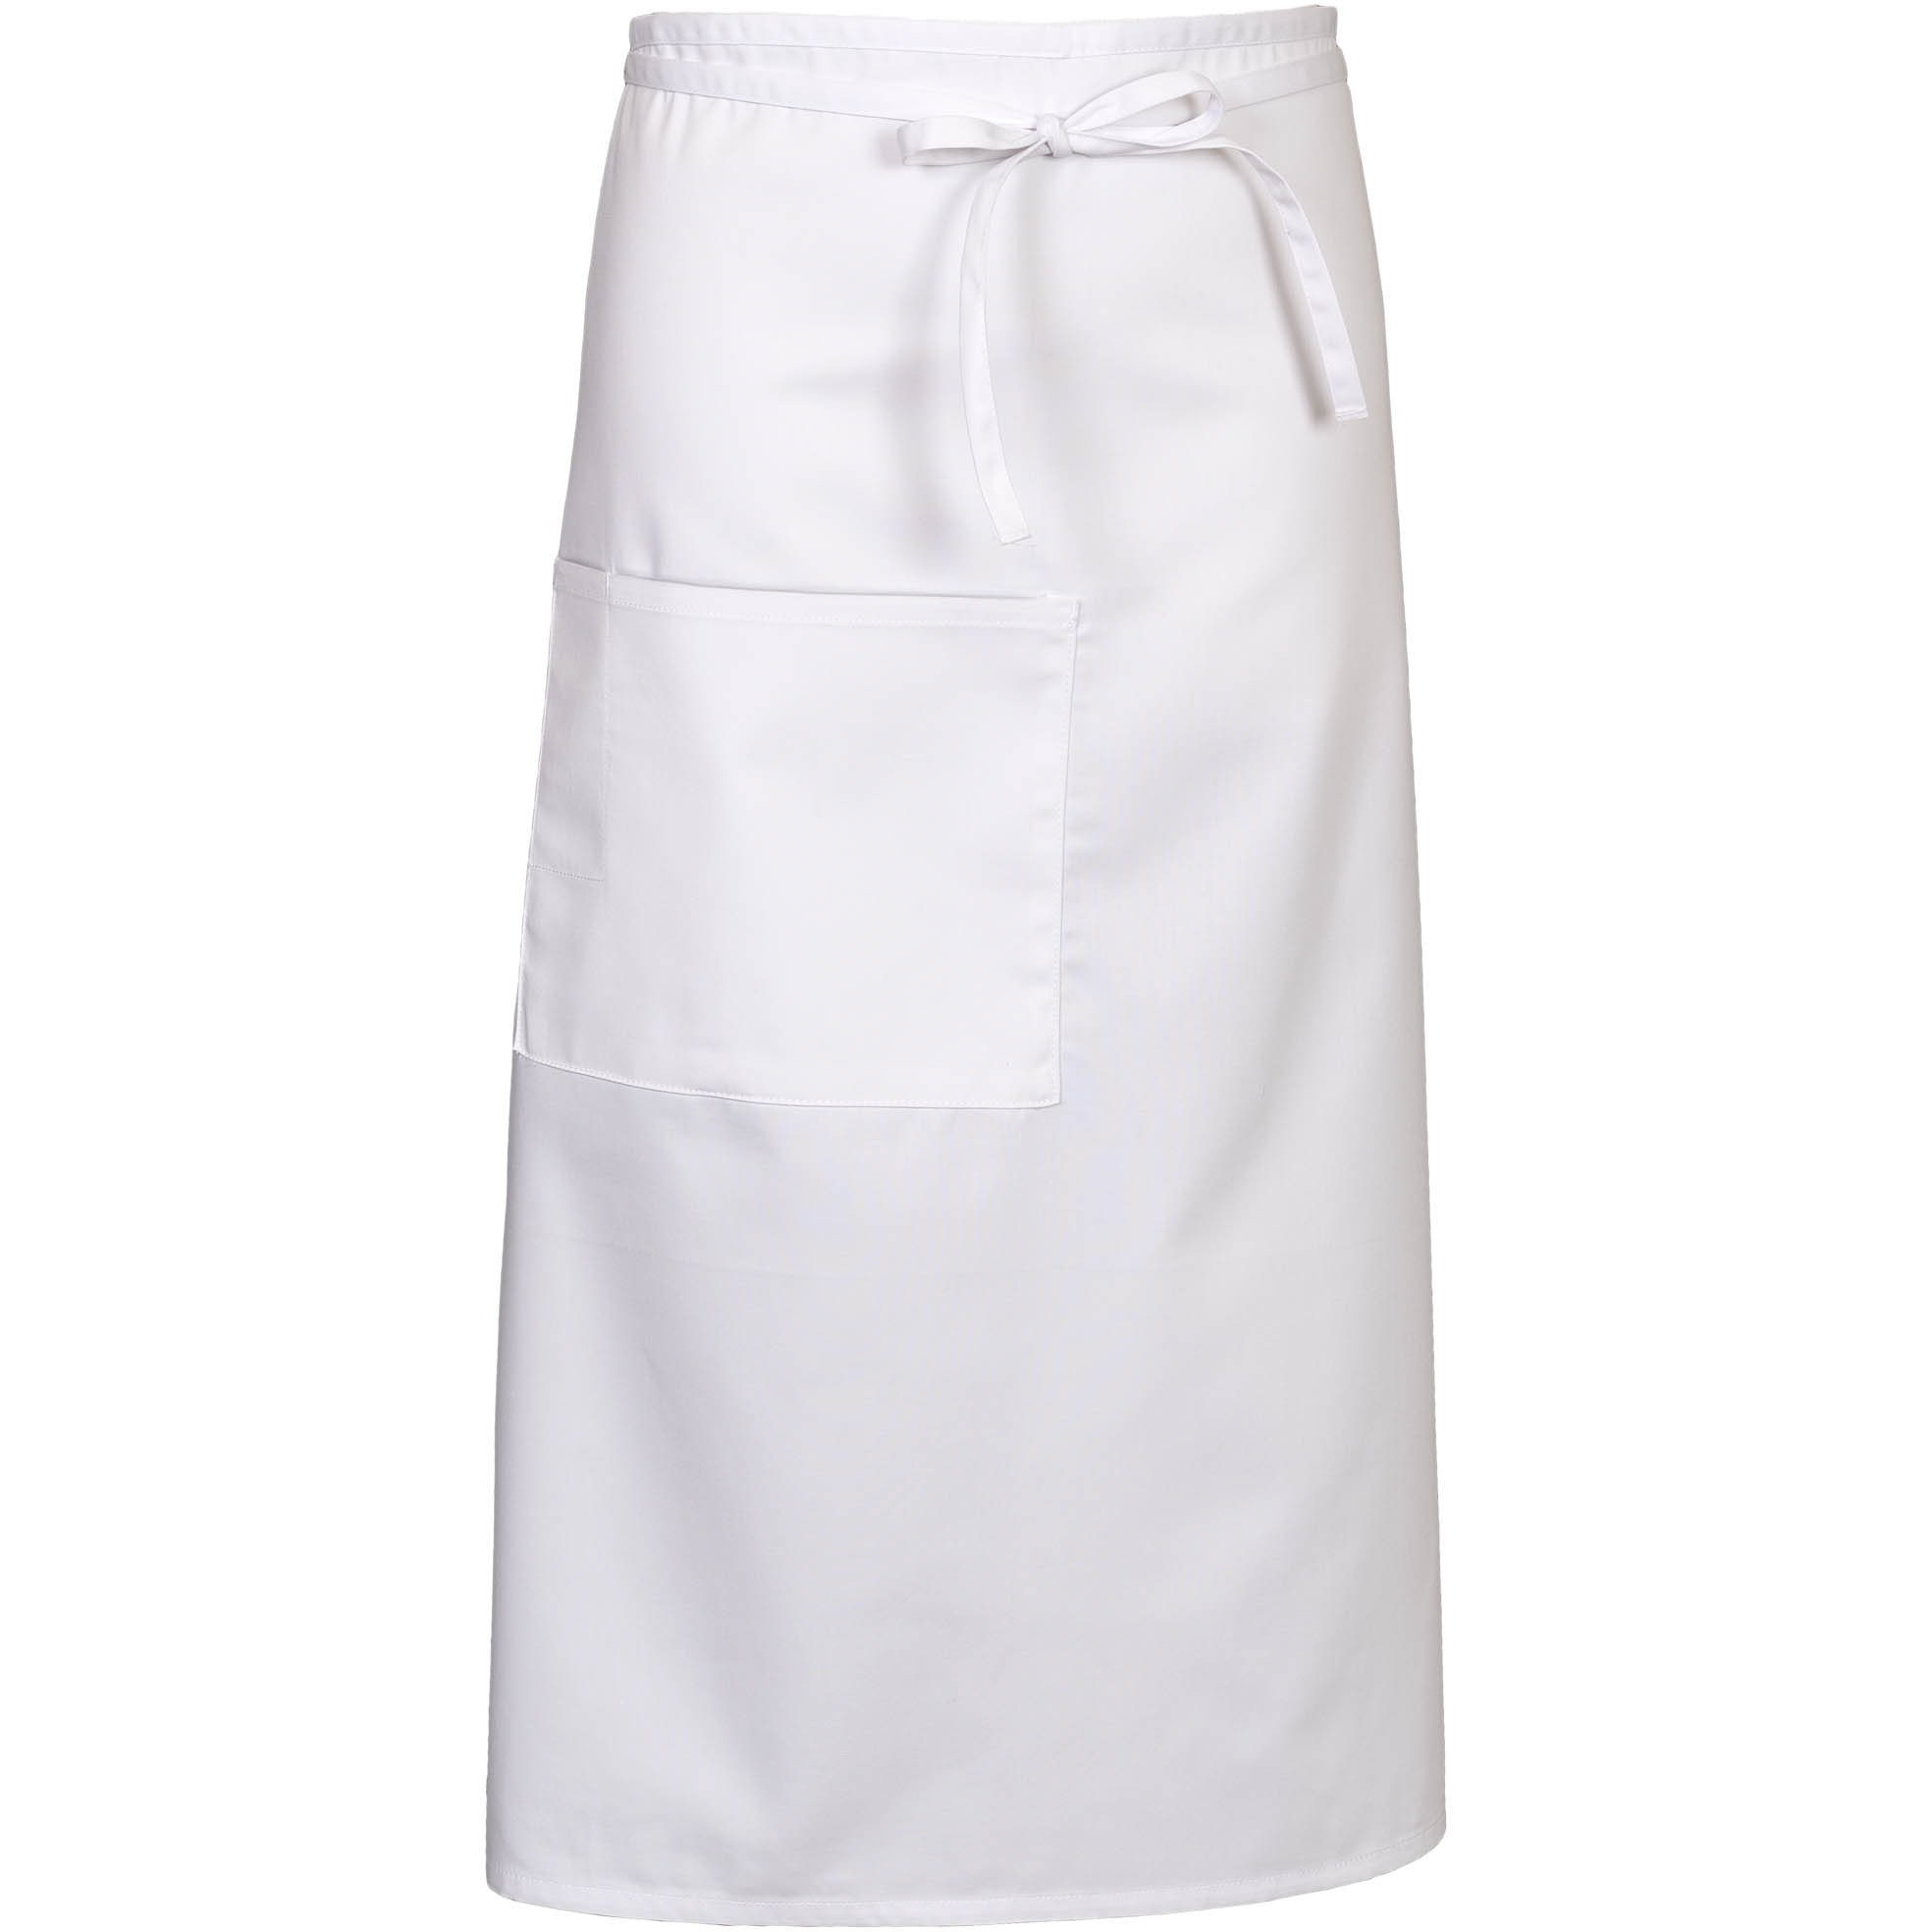 White bistro apron - Fame E24 White